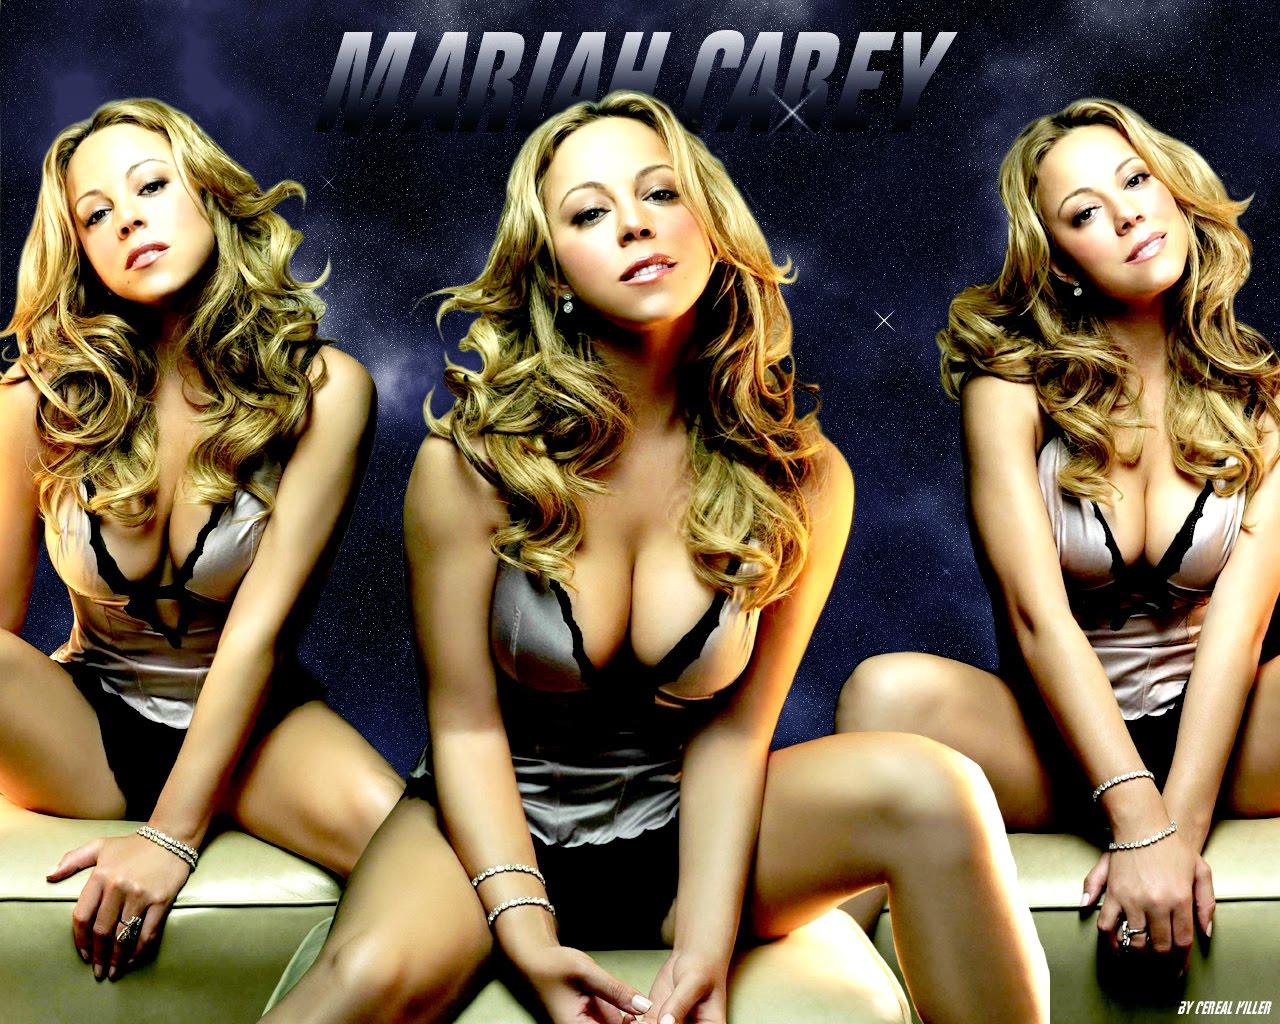 http://1.bp.blogspot.com/_HK8vaNAz8ks/TGYTNQK_J-I/AAAAAAAAApY/ri43Yok2O4k/s1600/mariah_carey_53.jpg